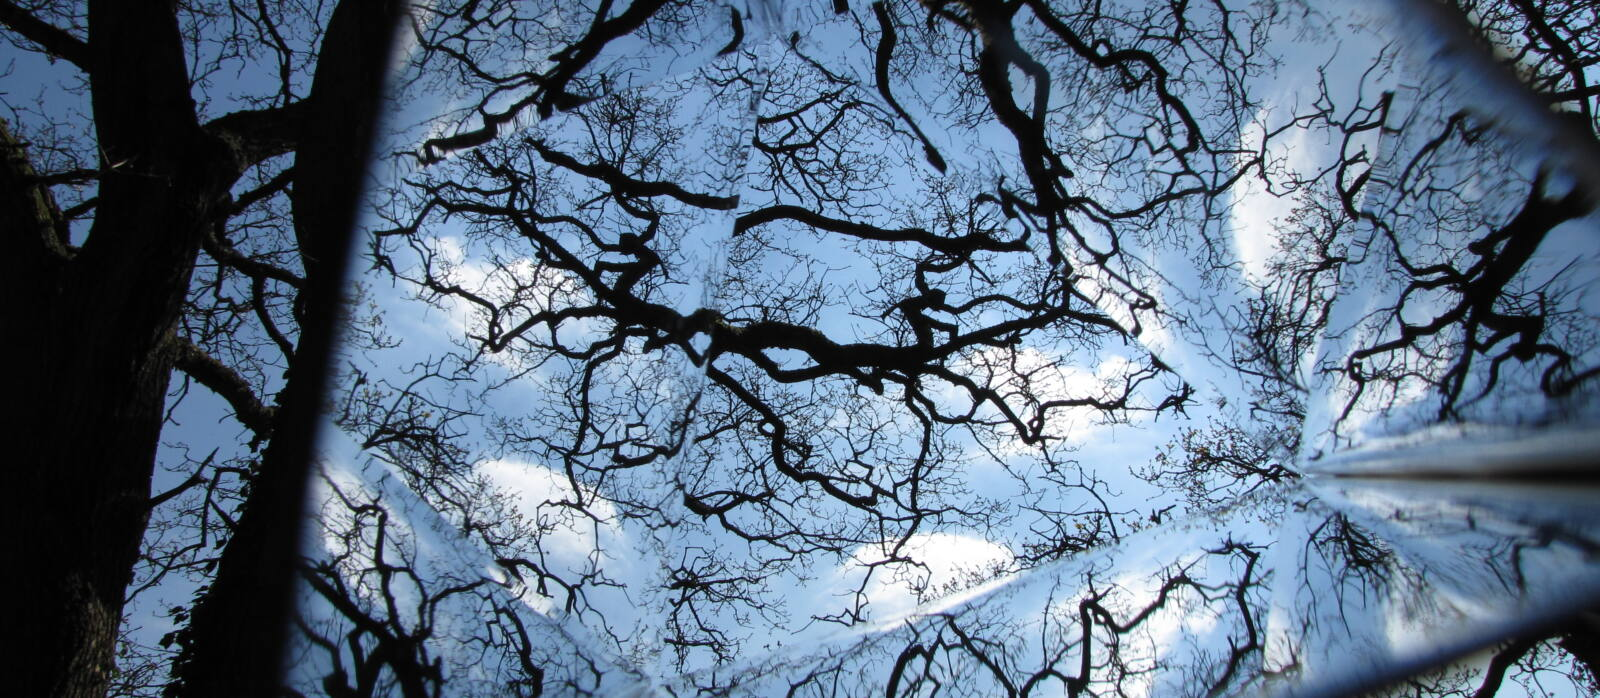 View of sky through kaleidoscope